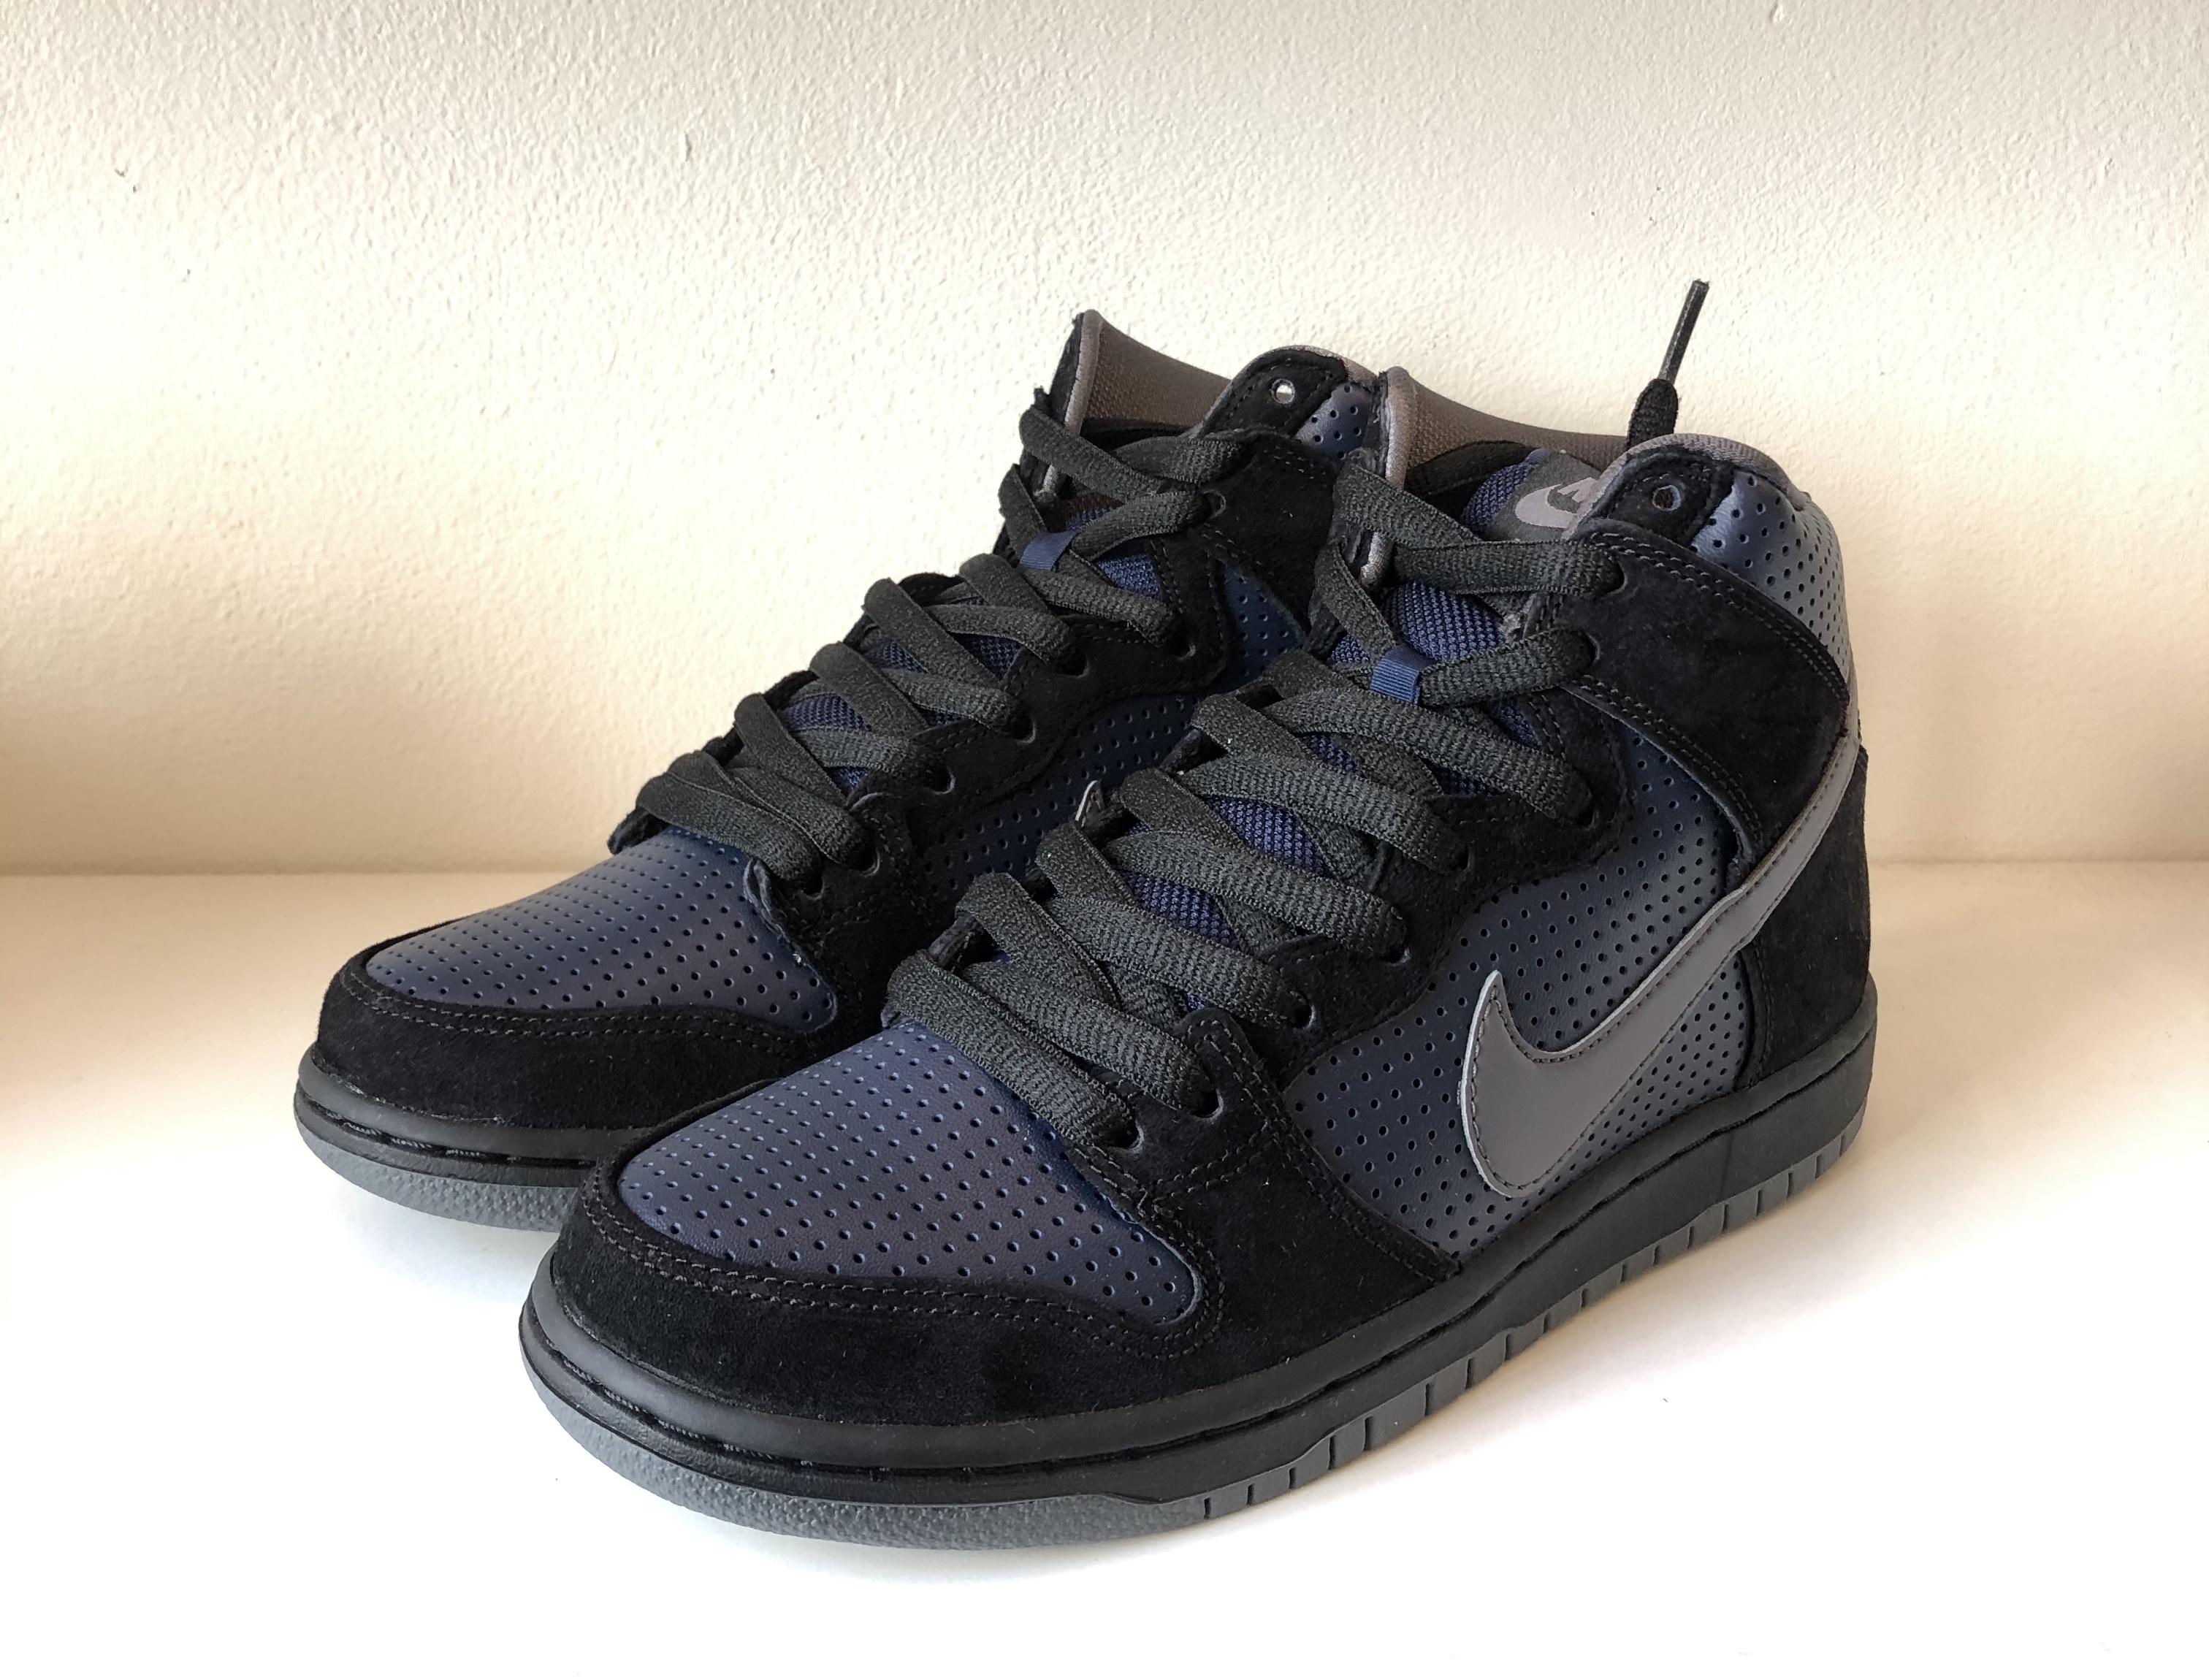 Nike SB Dunk High Gino Iannucci